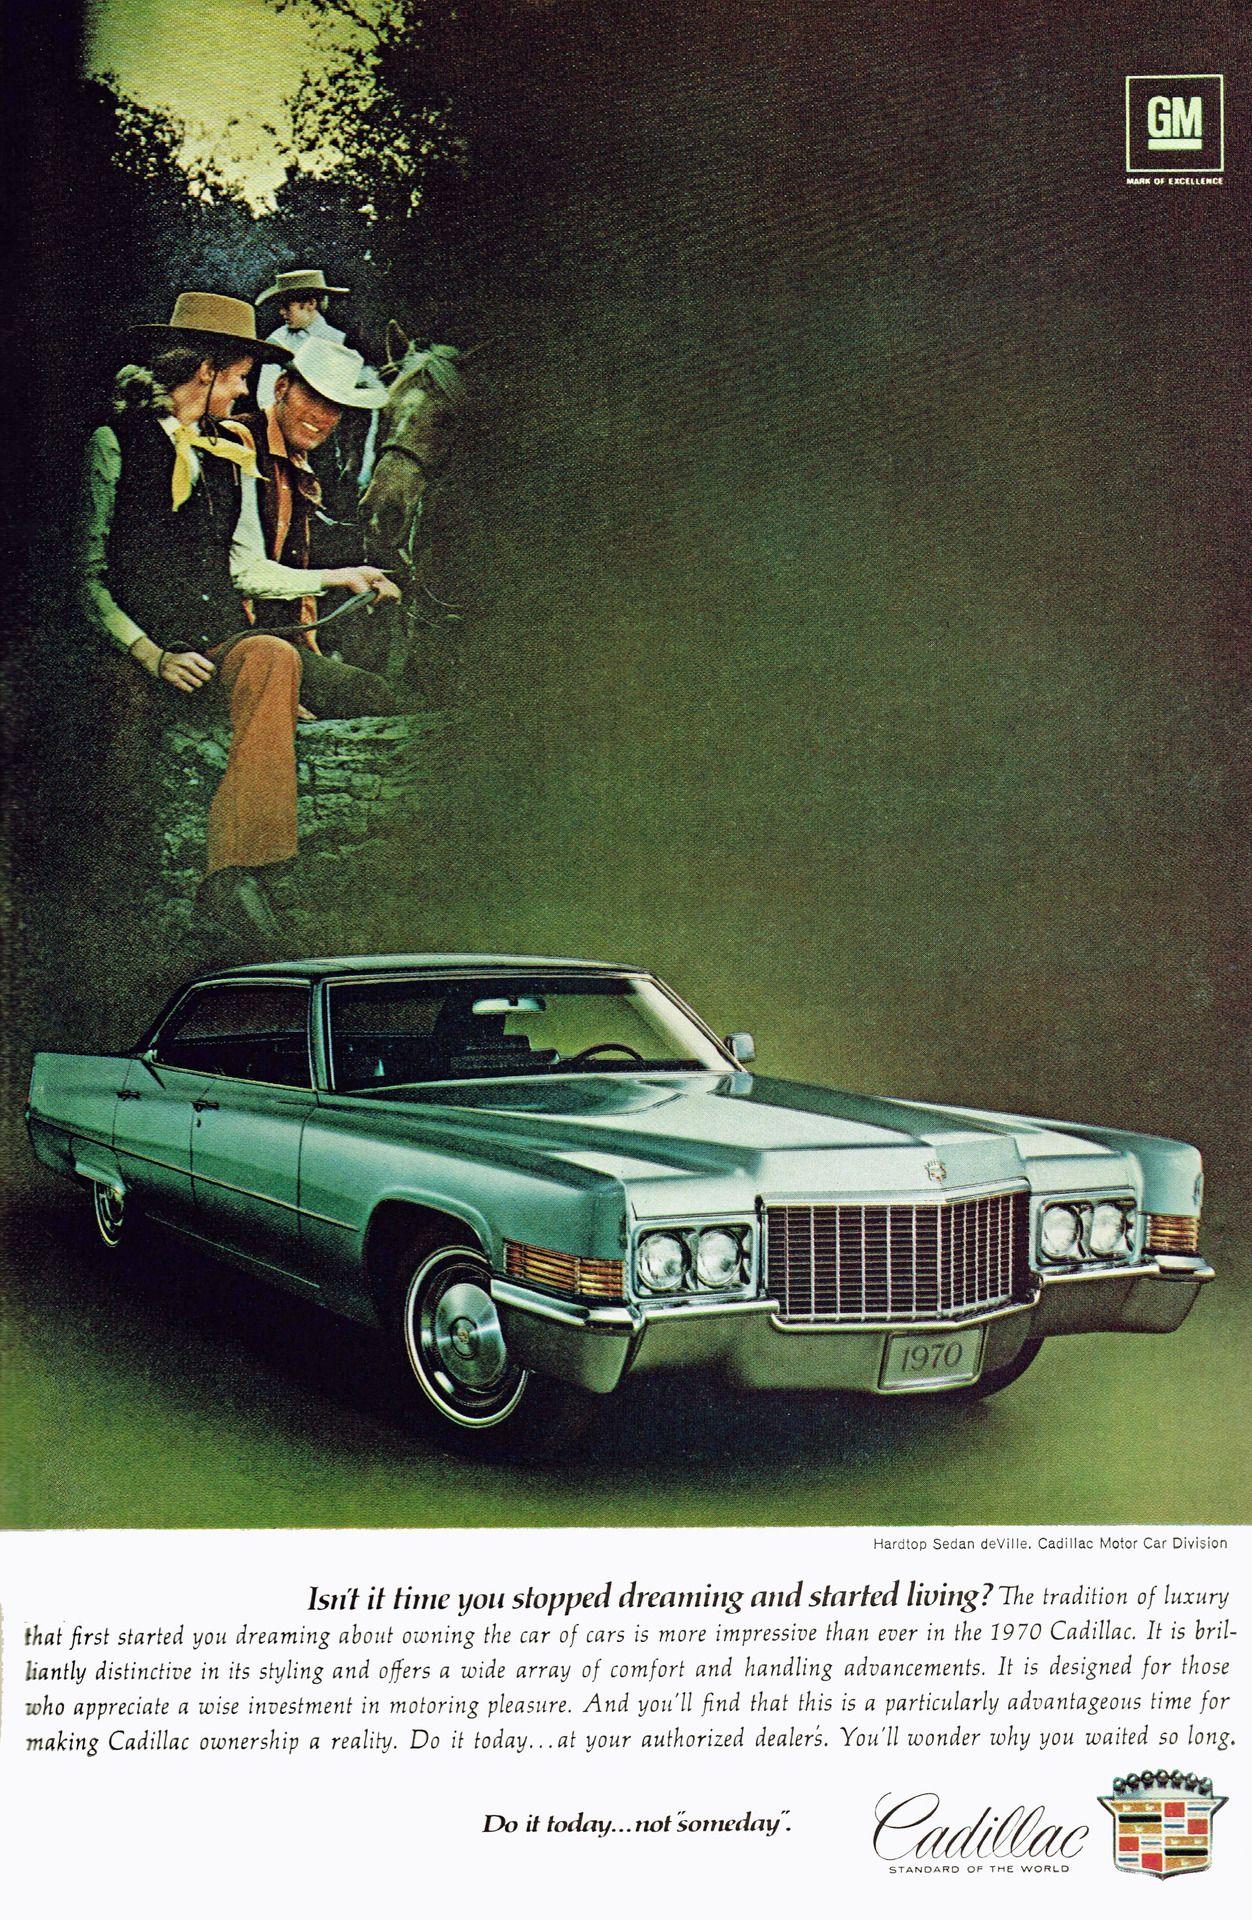 Cadillac Sedan deVille, 1970 Cadillac